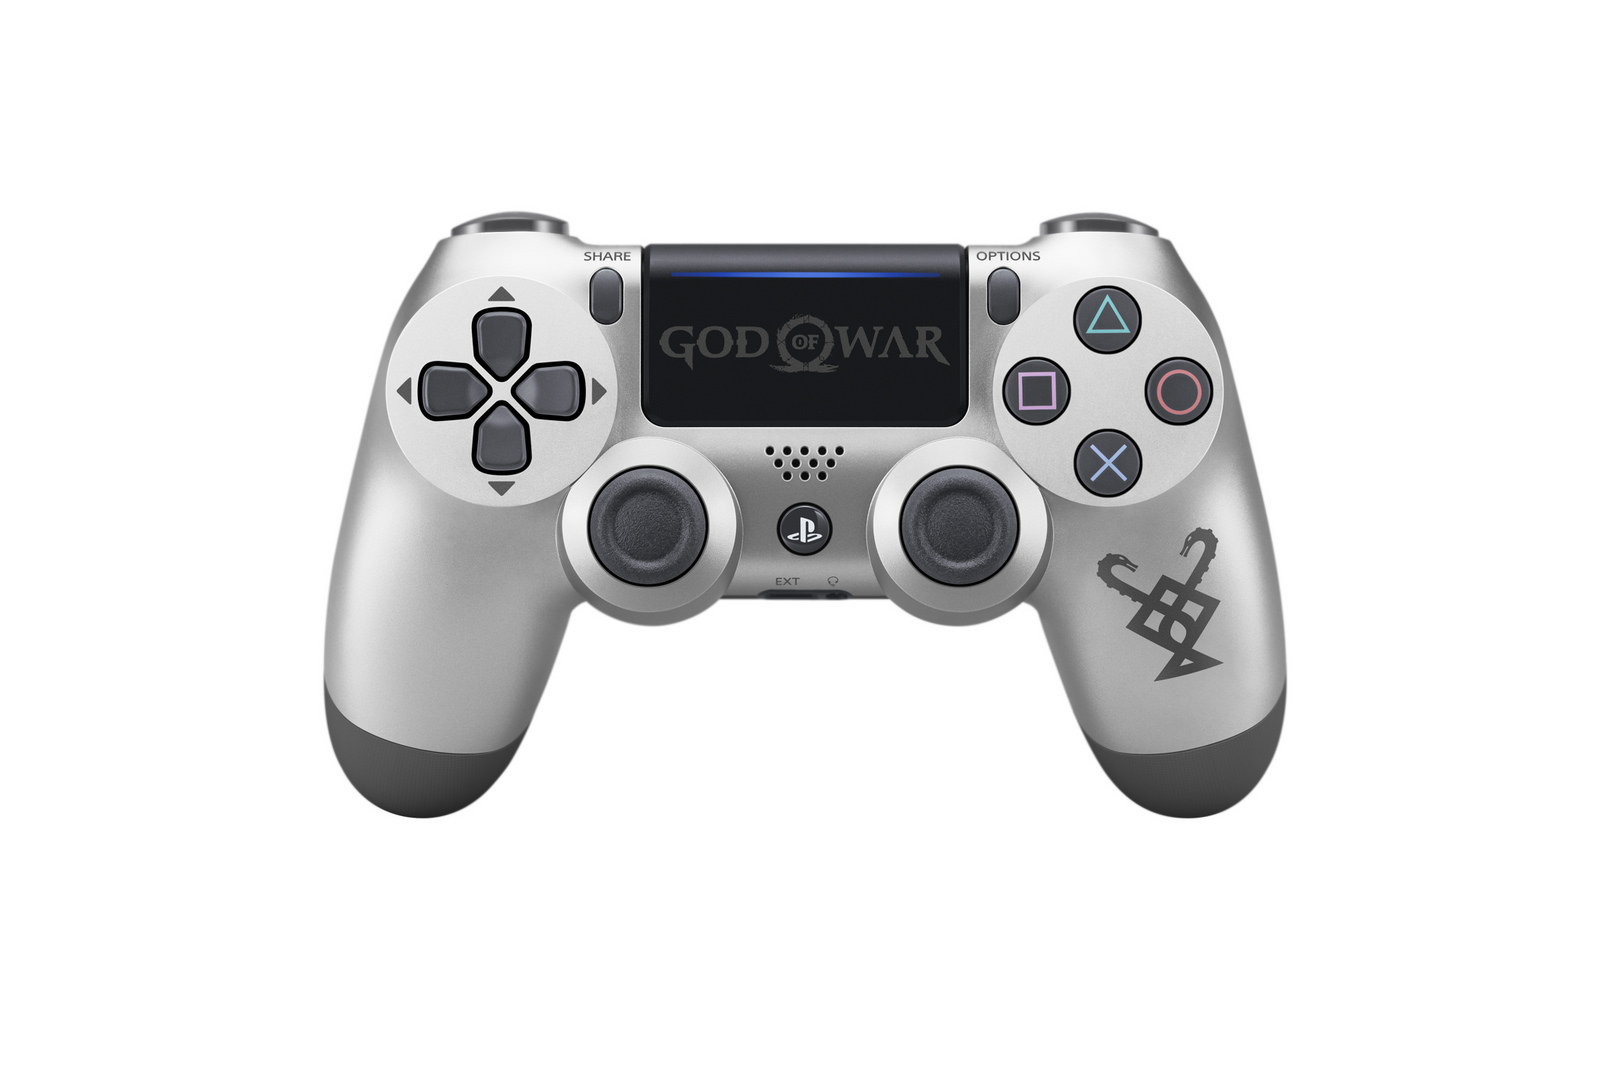 GodofWar PS4 Div 050